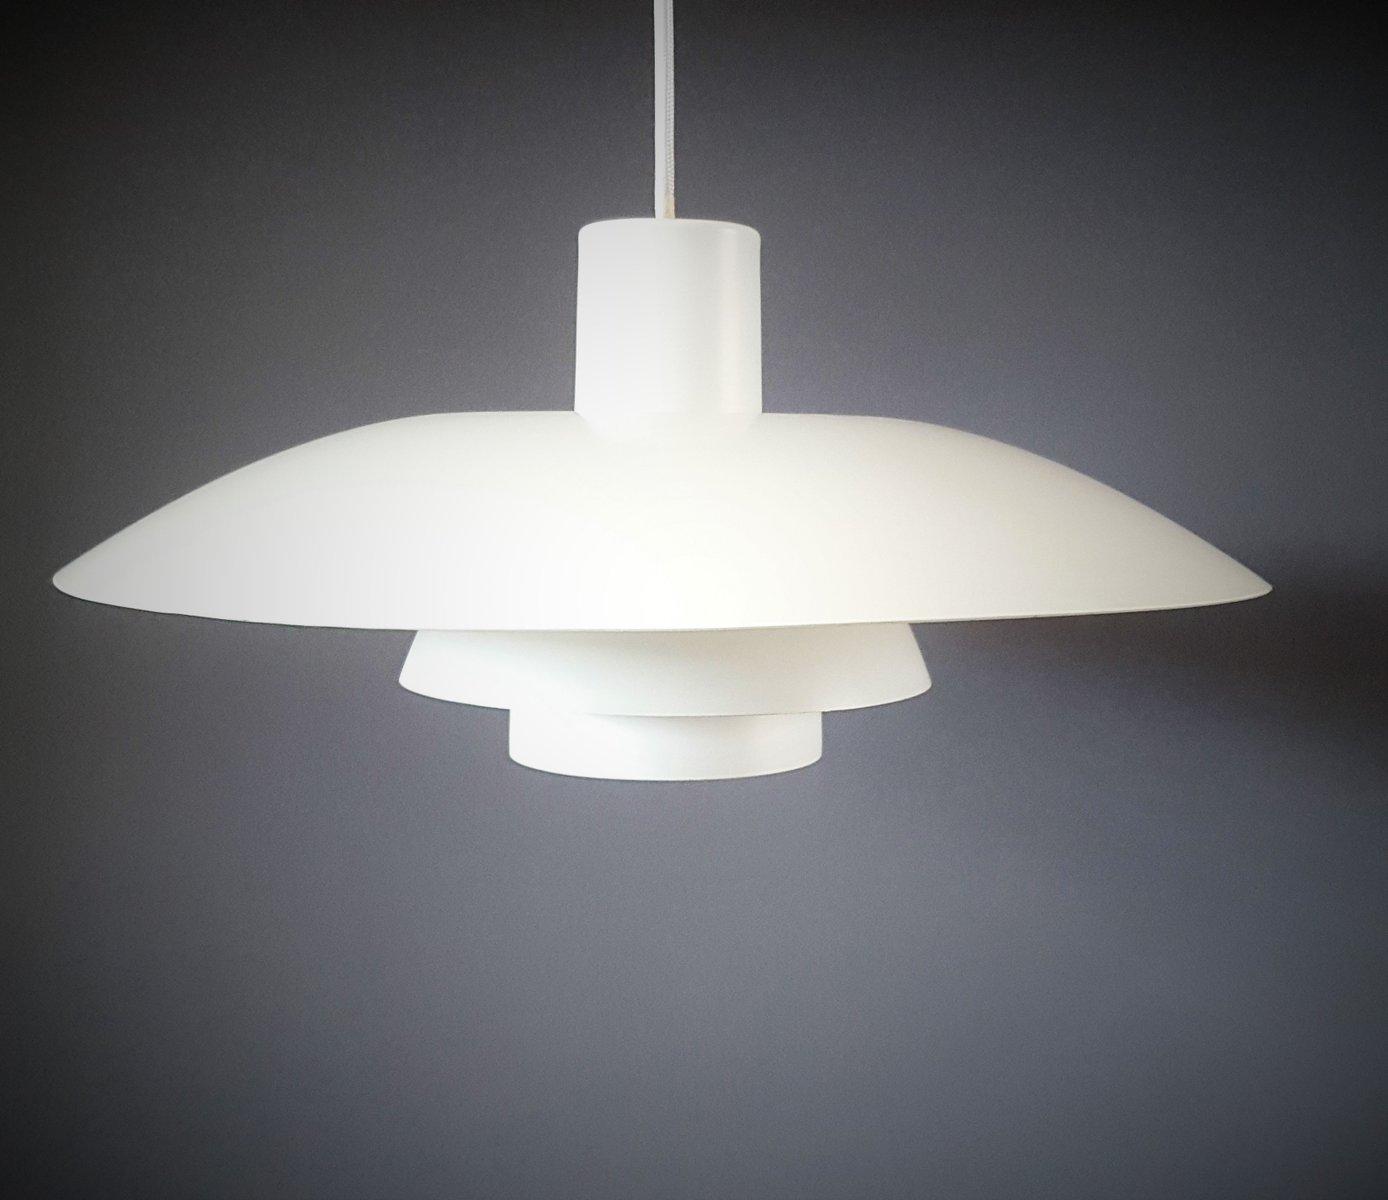 vintage white ph 4 3 pendant lamp by poul henningsen for louis poulsen for sale at pamono. Black Bedroom Furniture Sets. Home Design Ideas